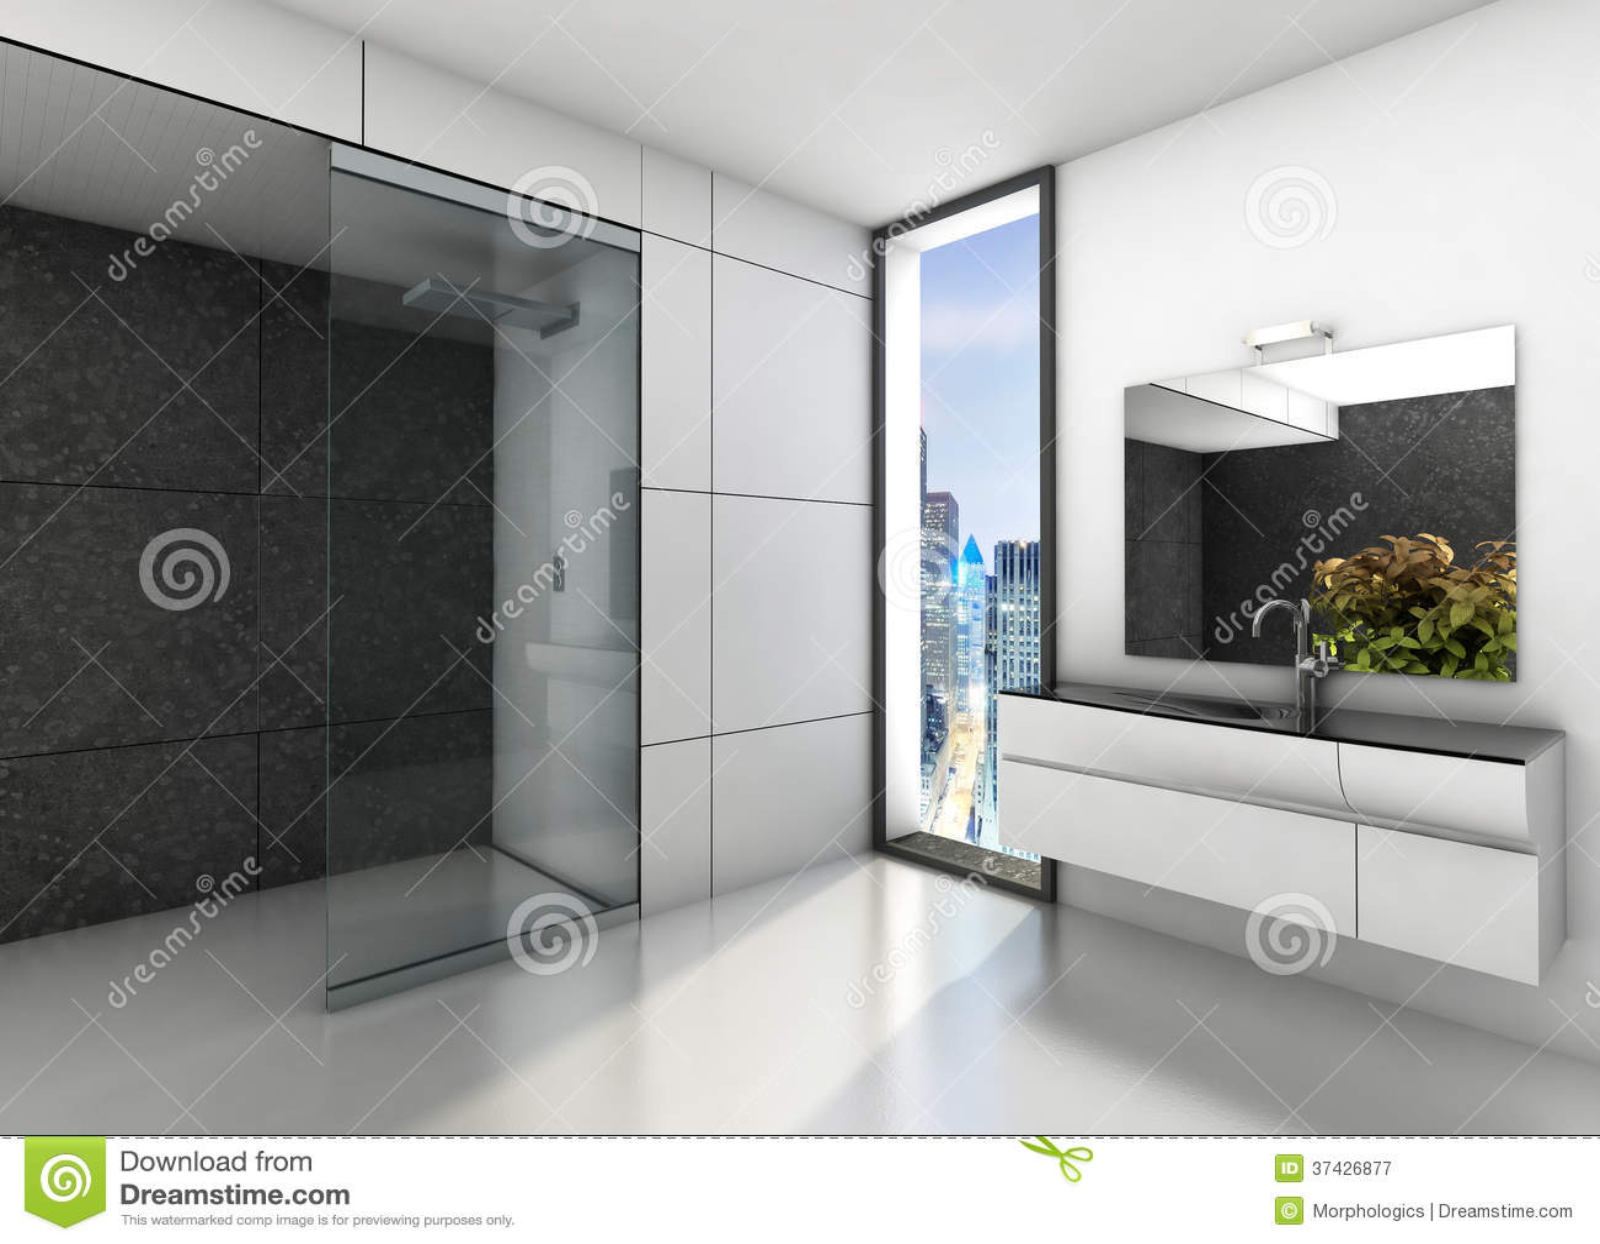 Moderne badkamers royalty vrije stock fotografie afbeelding 37426877 - Badkamers ...